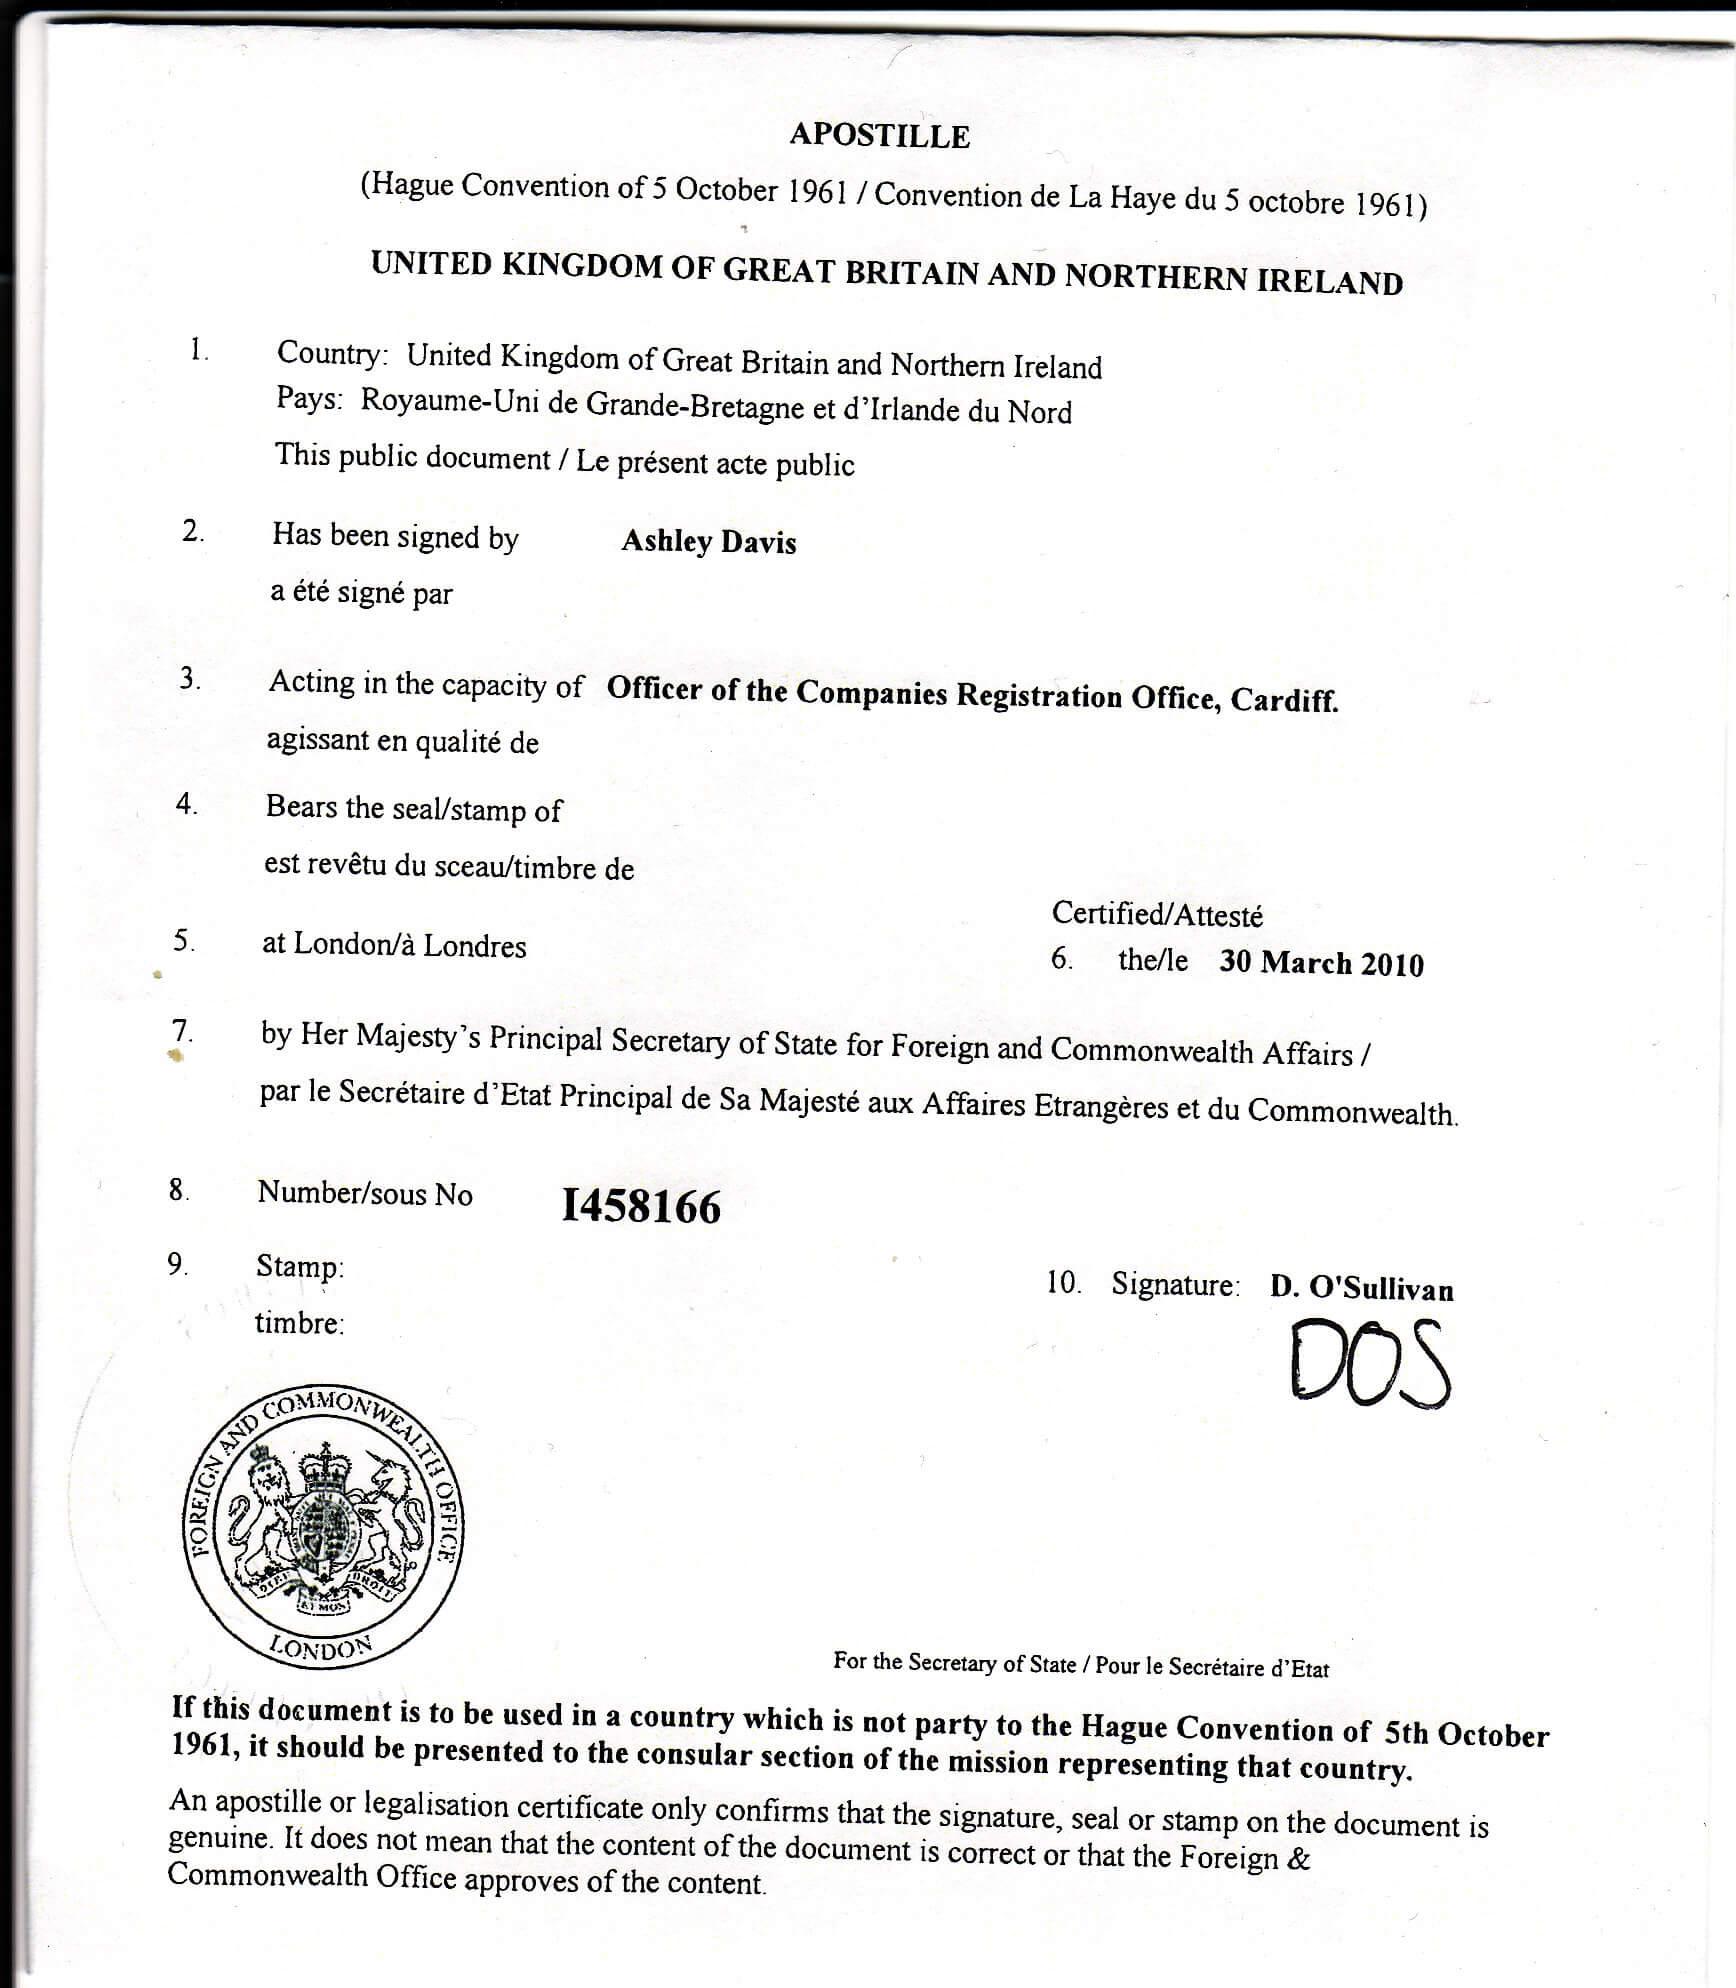 Apostille Certificates - A Brief Guide